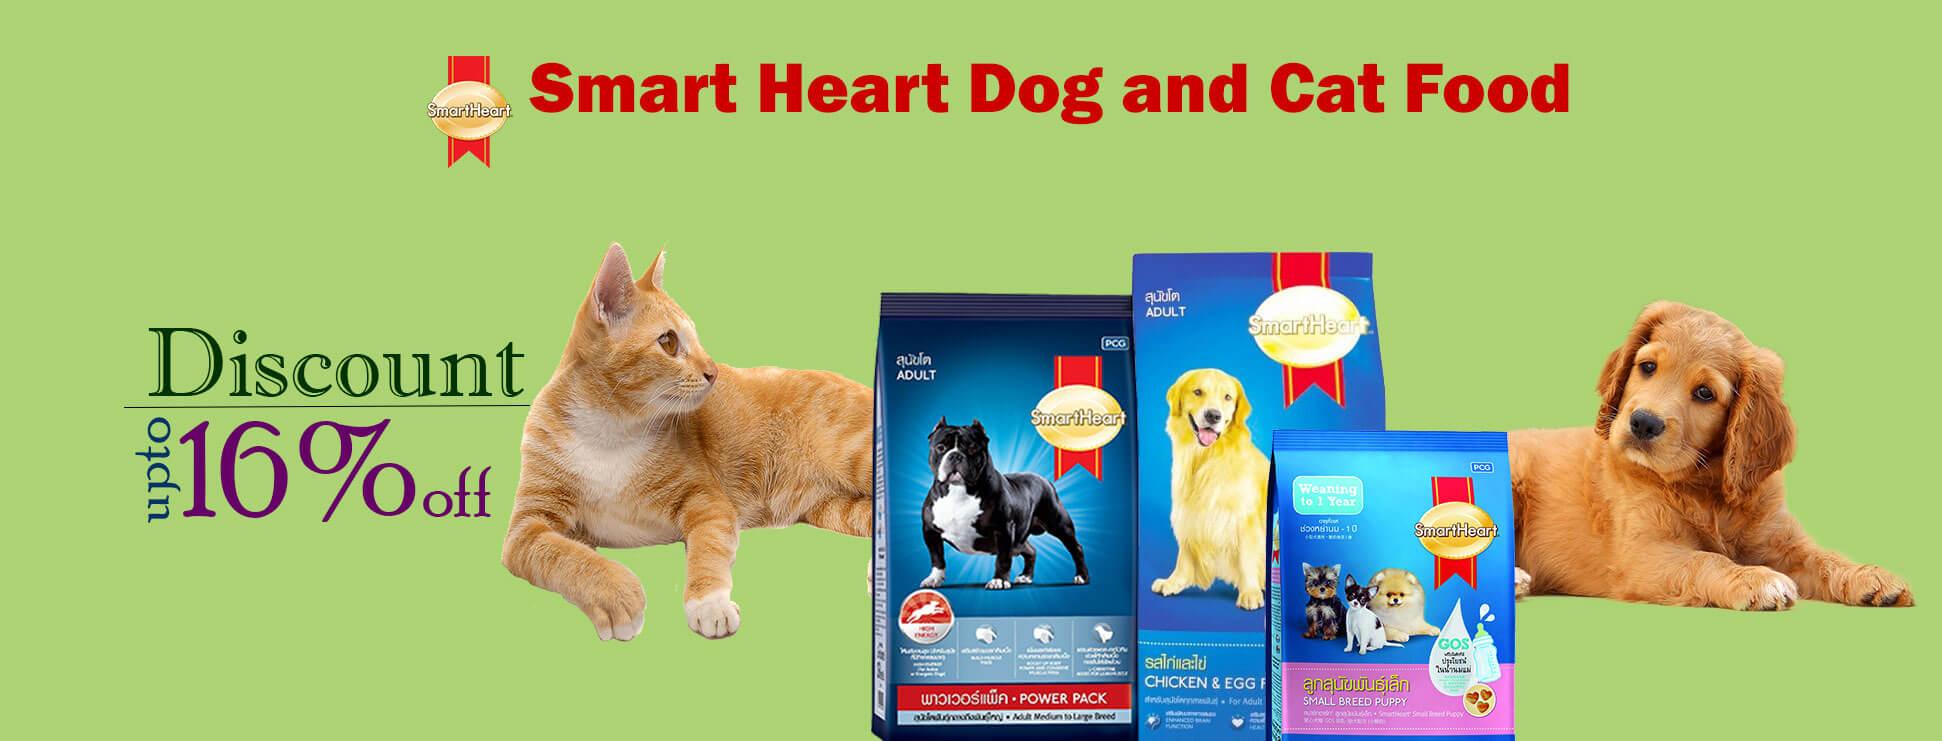 Smartheart_dog_food.jpg